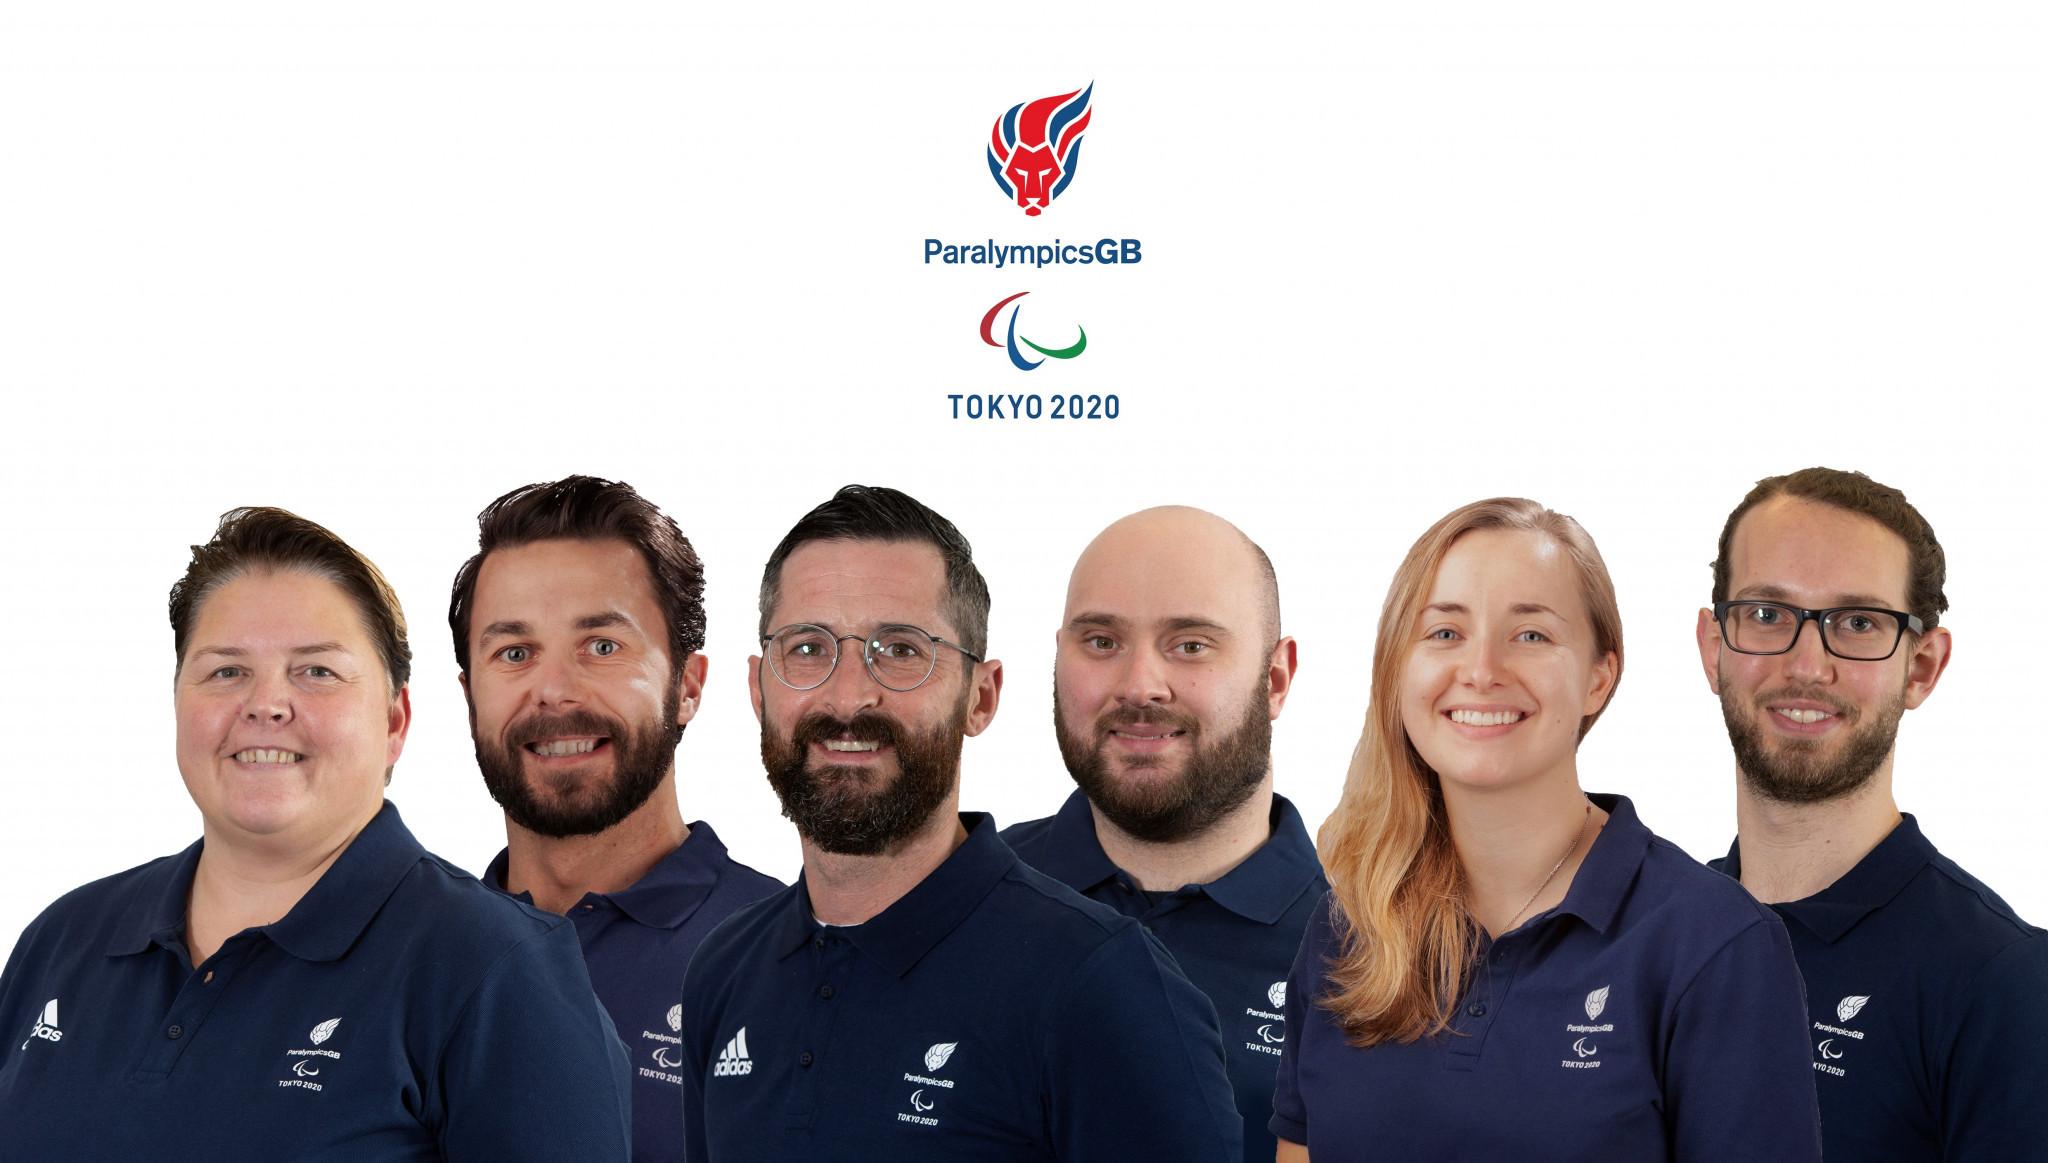 Six athletes have been selected to represent Britain in Para shooting at Tokyo 2020 ©ParalympicsGB